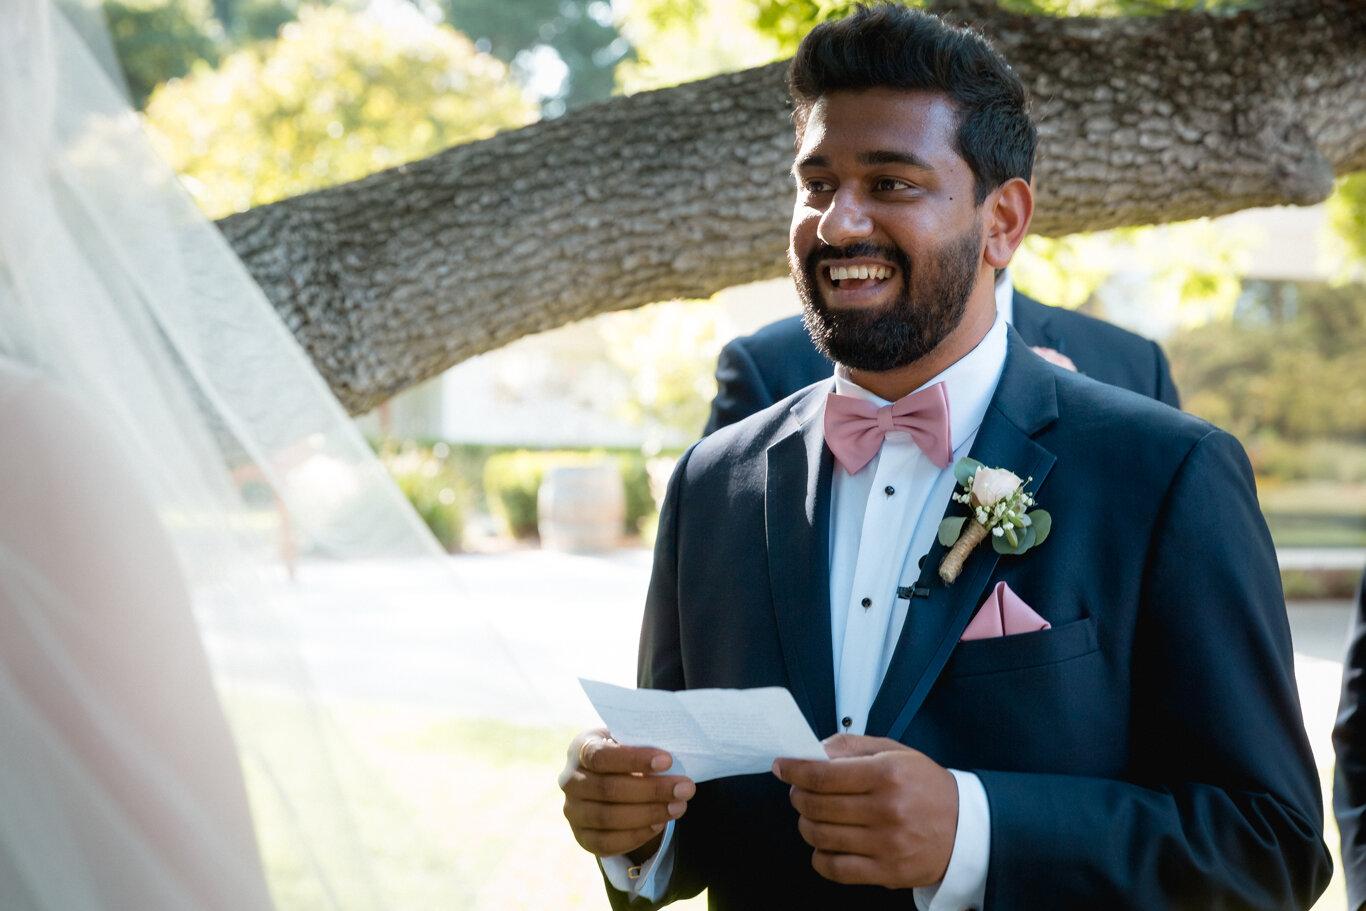 2019.08.24_Emily-Ashir-Wedding-at-the-Maples-5876.jpg